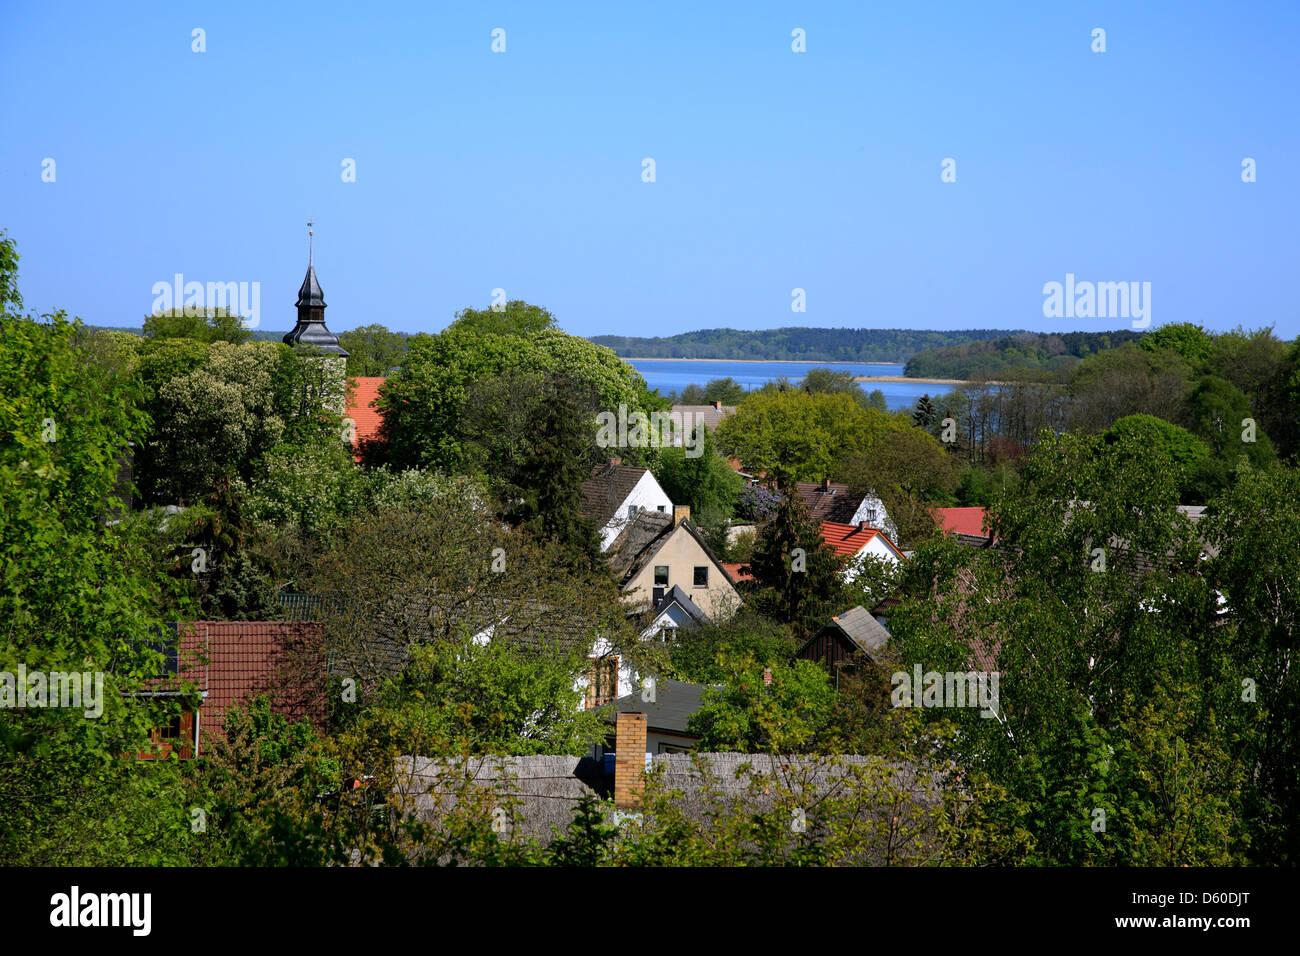 Village Benz, Usedom Island, Mecklenburg Western Pomerania, Germany - Stock Image